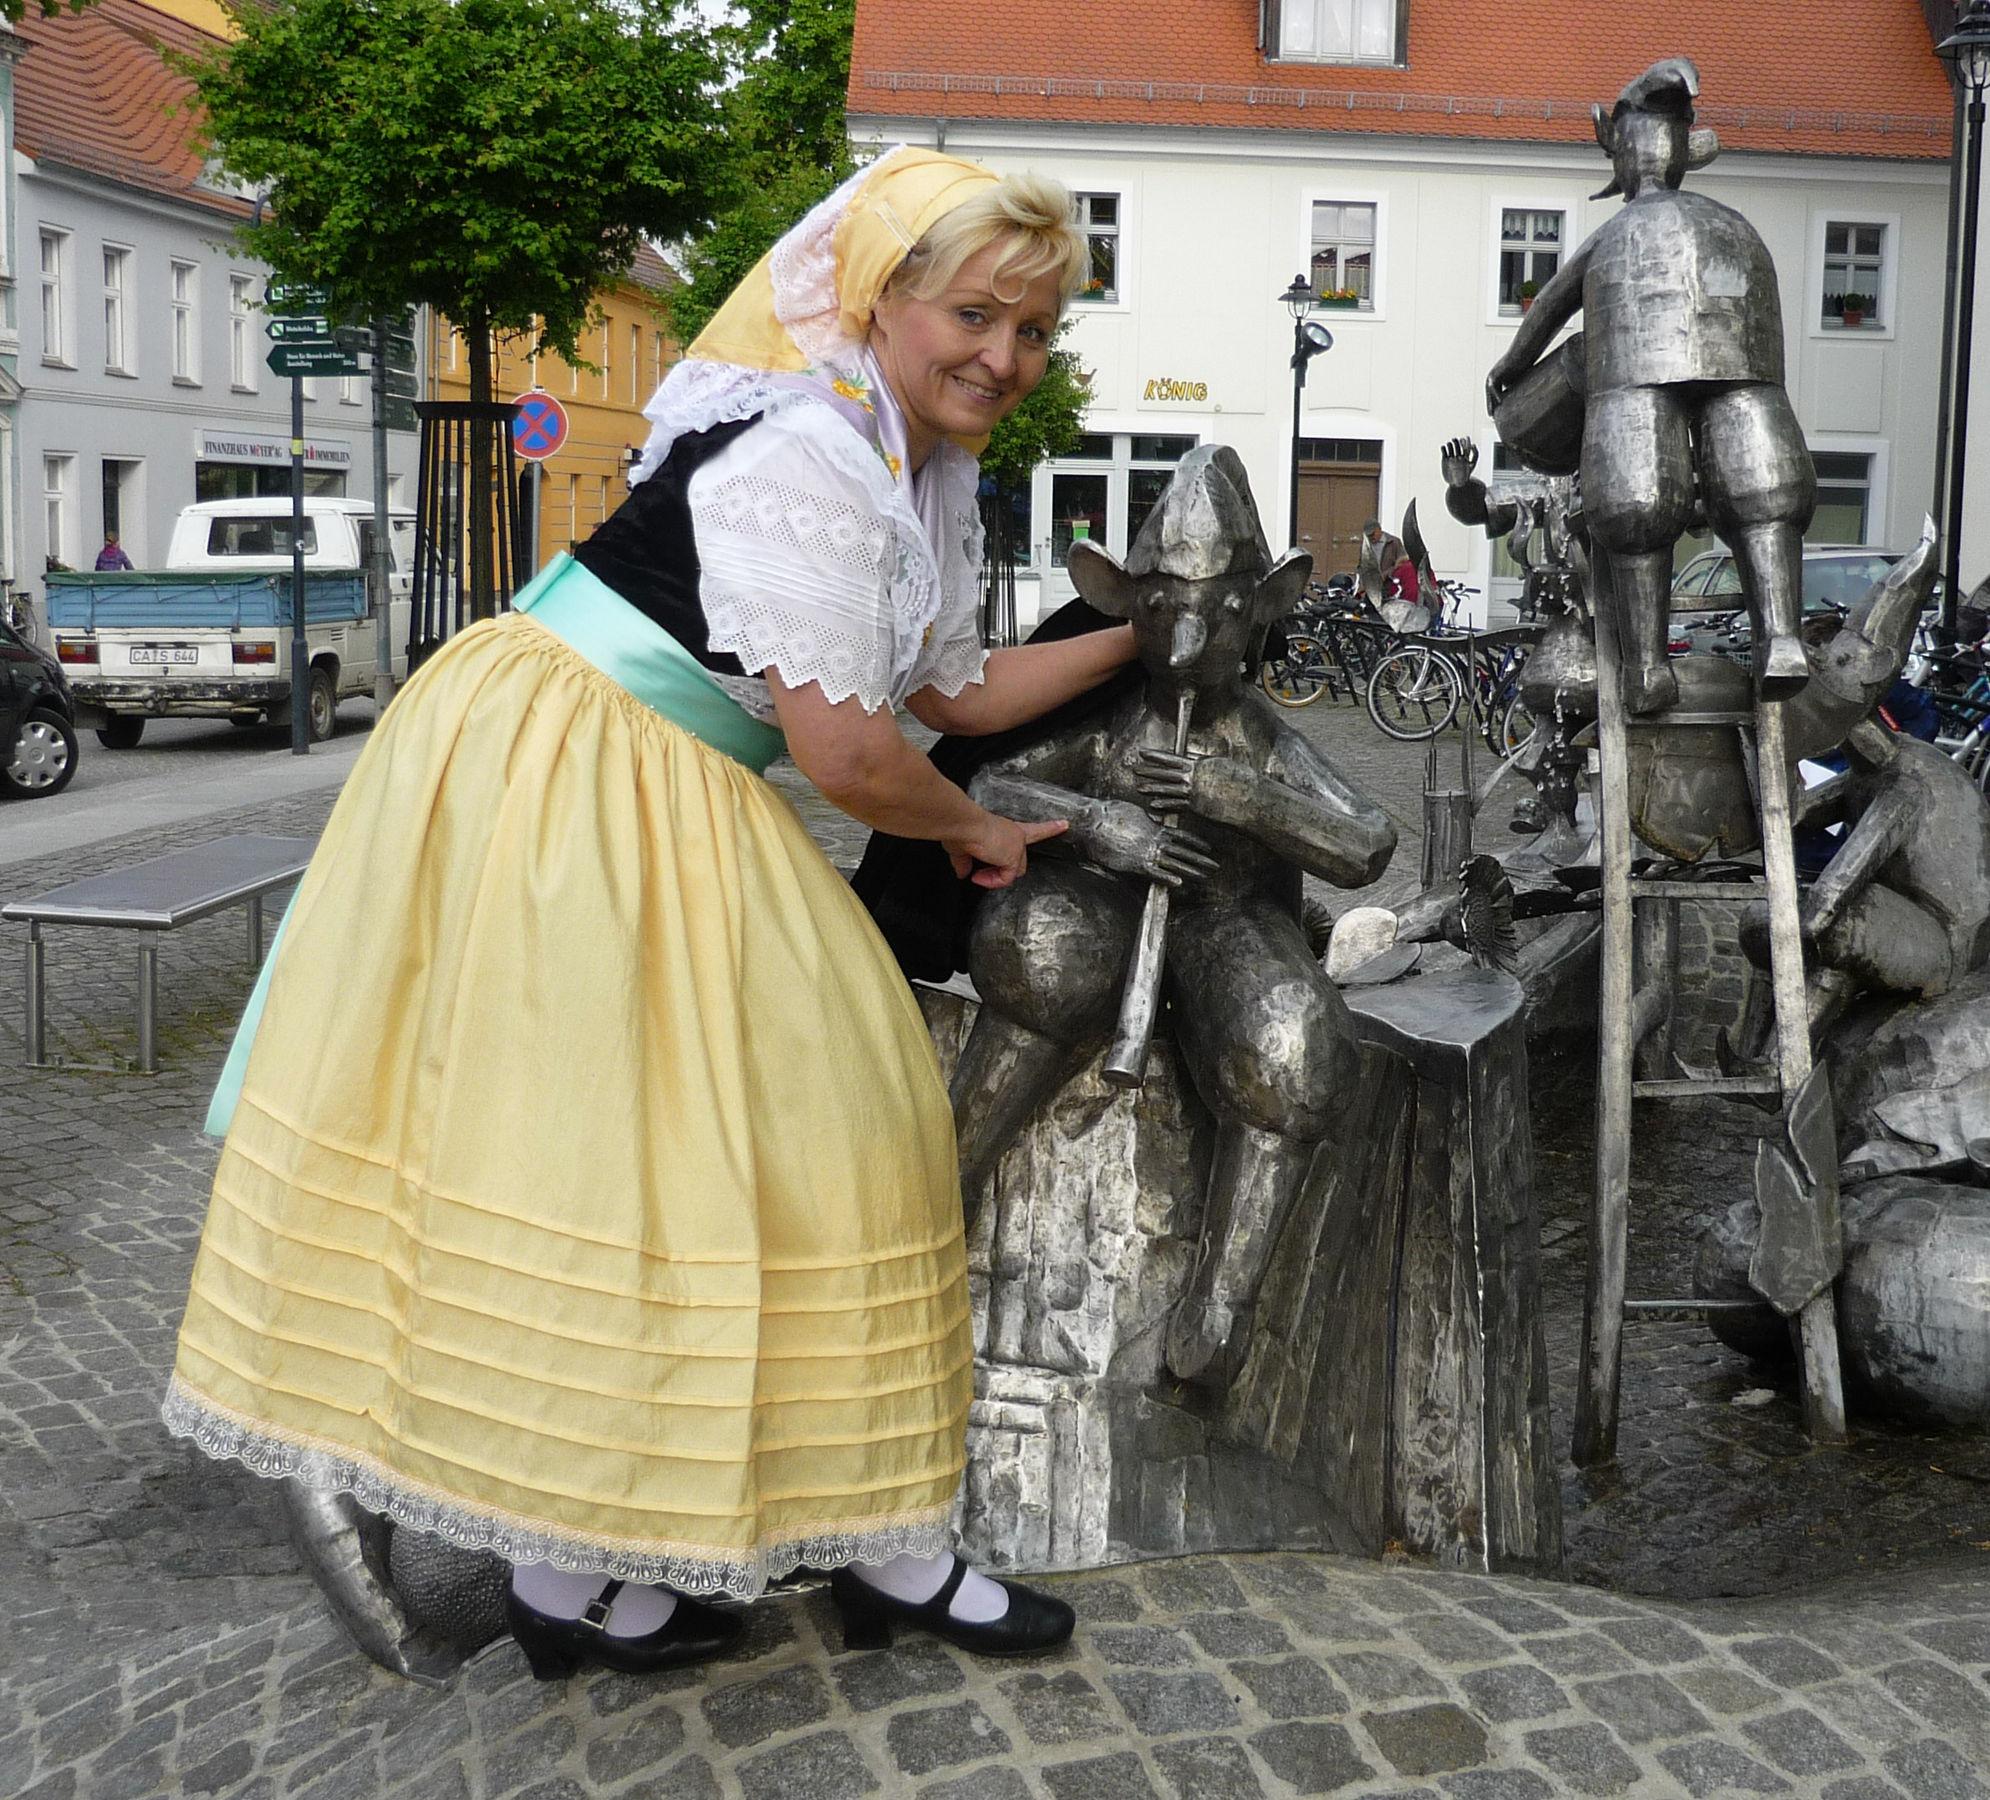 Milena in Spreewälder Festtracht, Foto: Monika Baumgart, Lizenz: Monika Baumgart